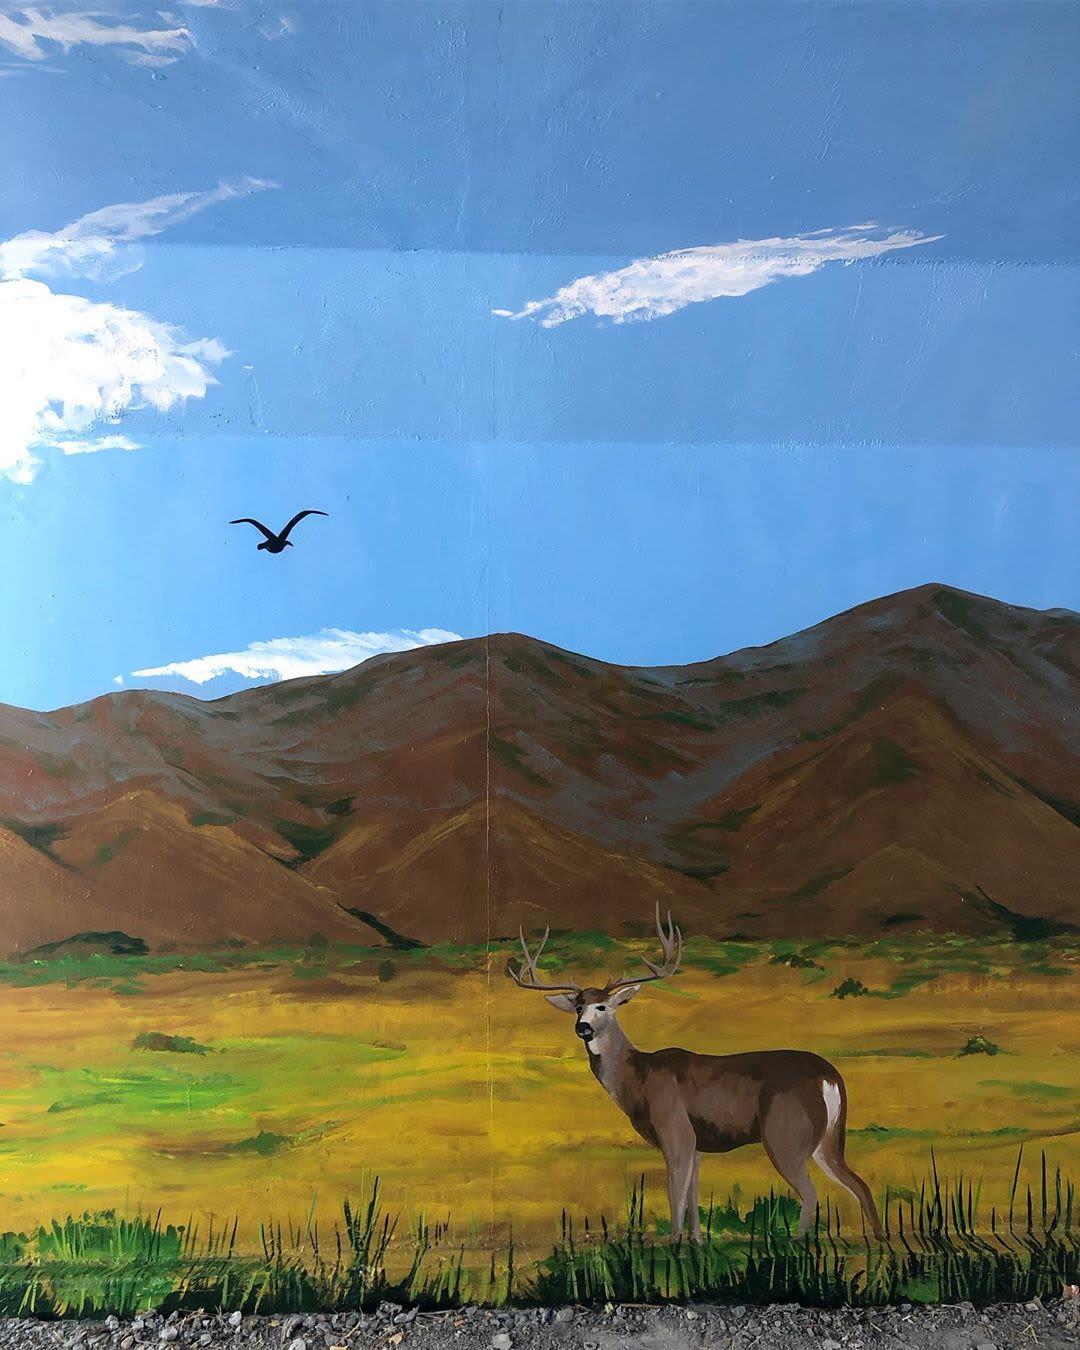 Street Murals by Josh Scheuerman seen at Jordan River Parkway Trail, Salt Lake City - 60s Mural